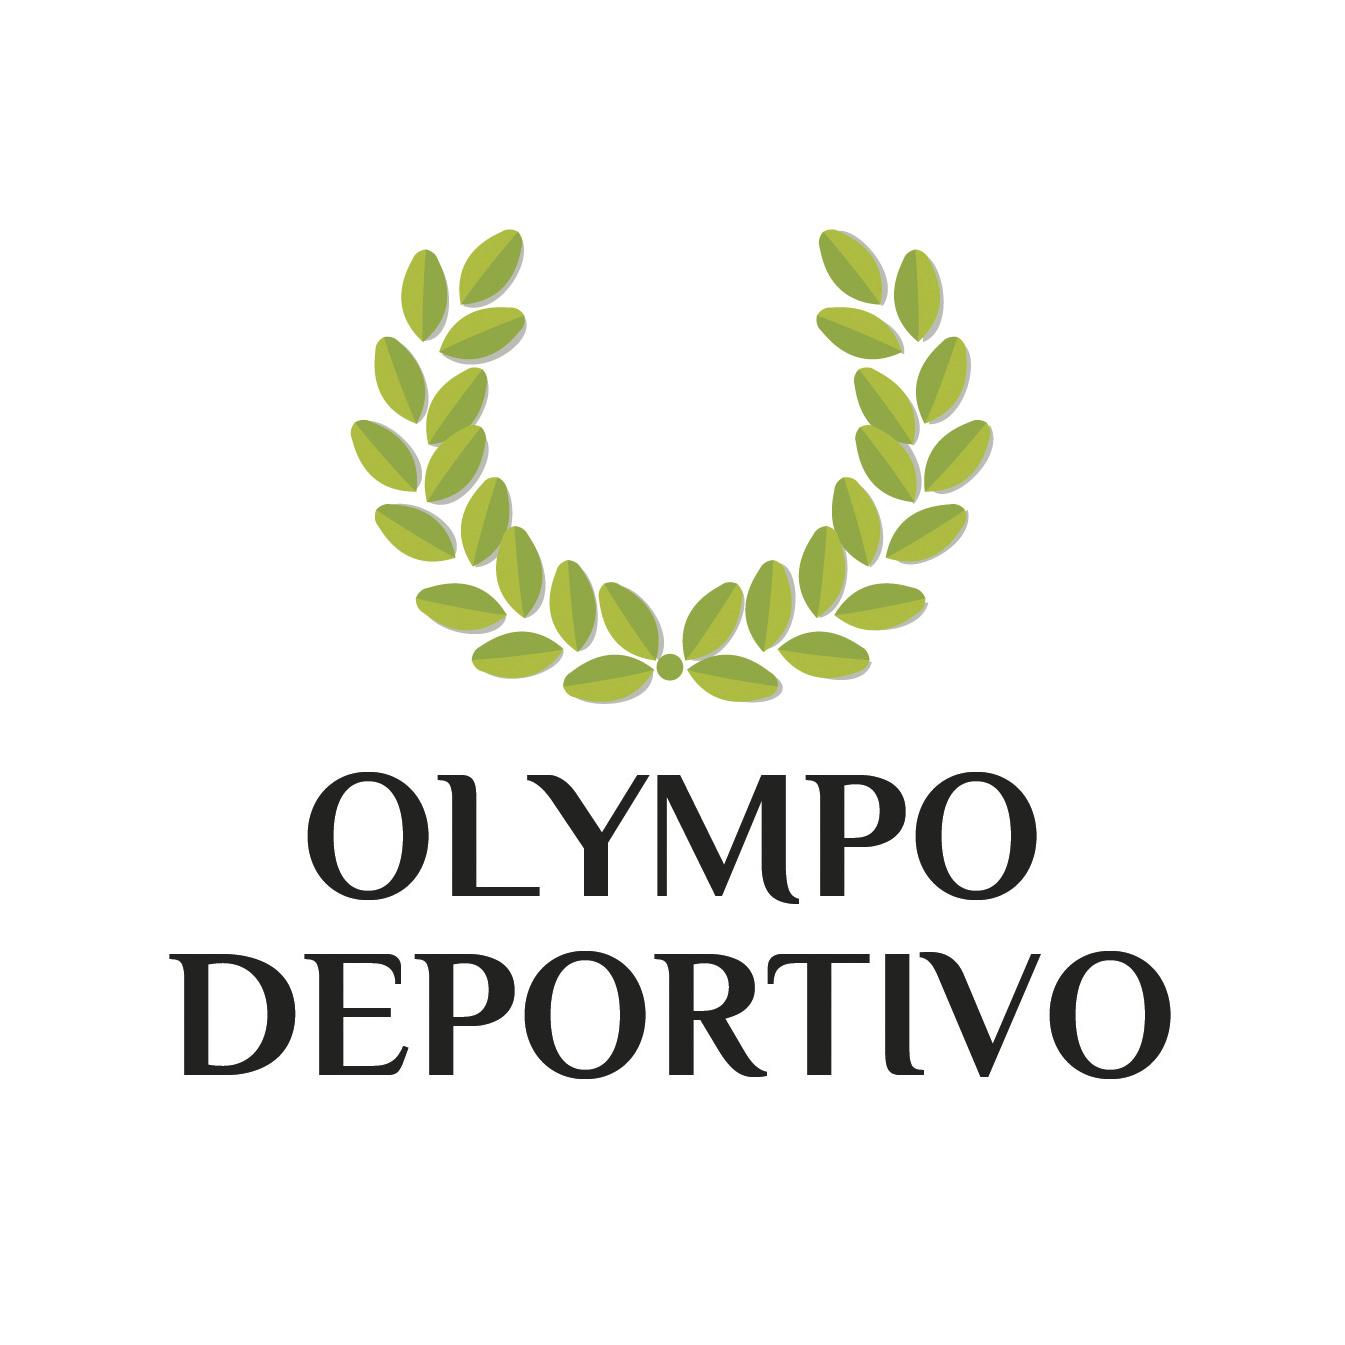 Olympo Deportivo